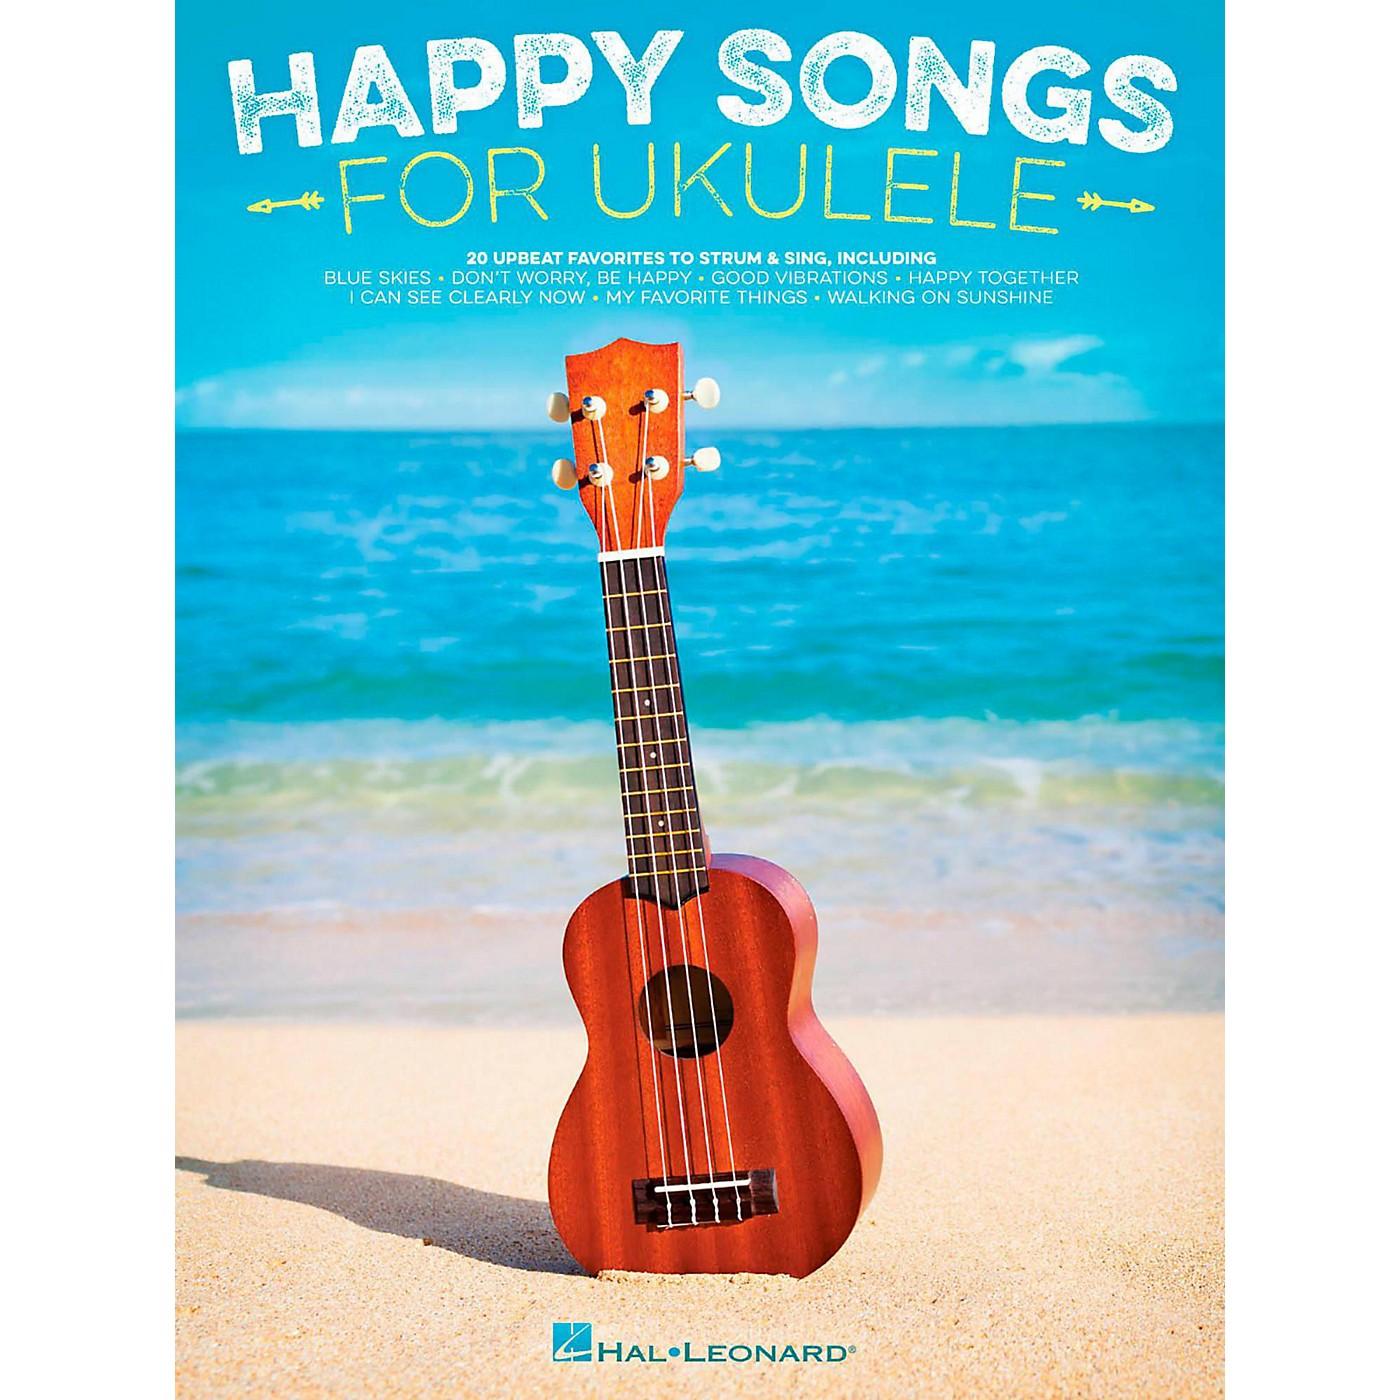 Hal Leonard Happy Songs for Ukulele - 20 Upbeat Favorites to Strum & Sing thumbnail